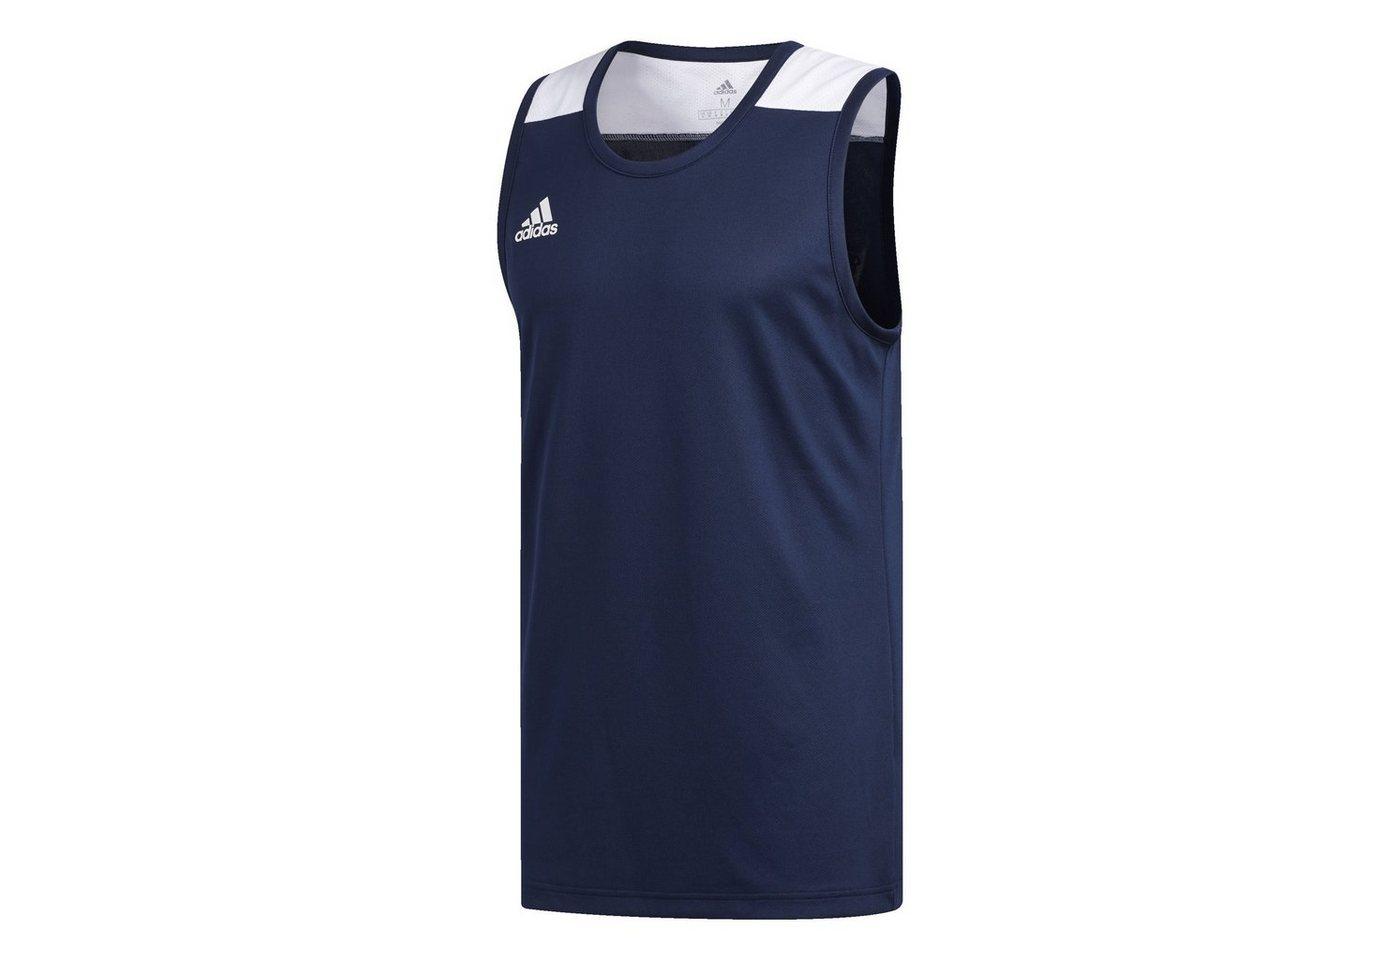 adidas Performance Basketballtrikot »Creator 365 Jersey« | Sportbekleidung > Trikots > Basketballtrikots | Blau | Polyester | adidas Performance